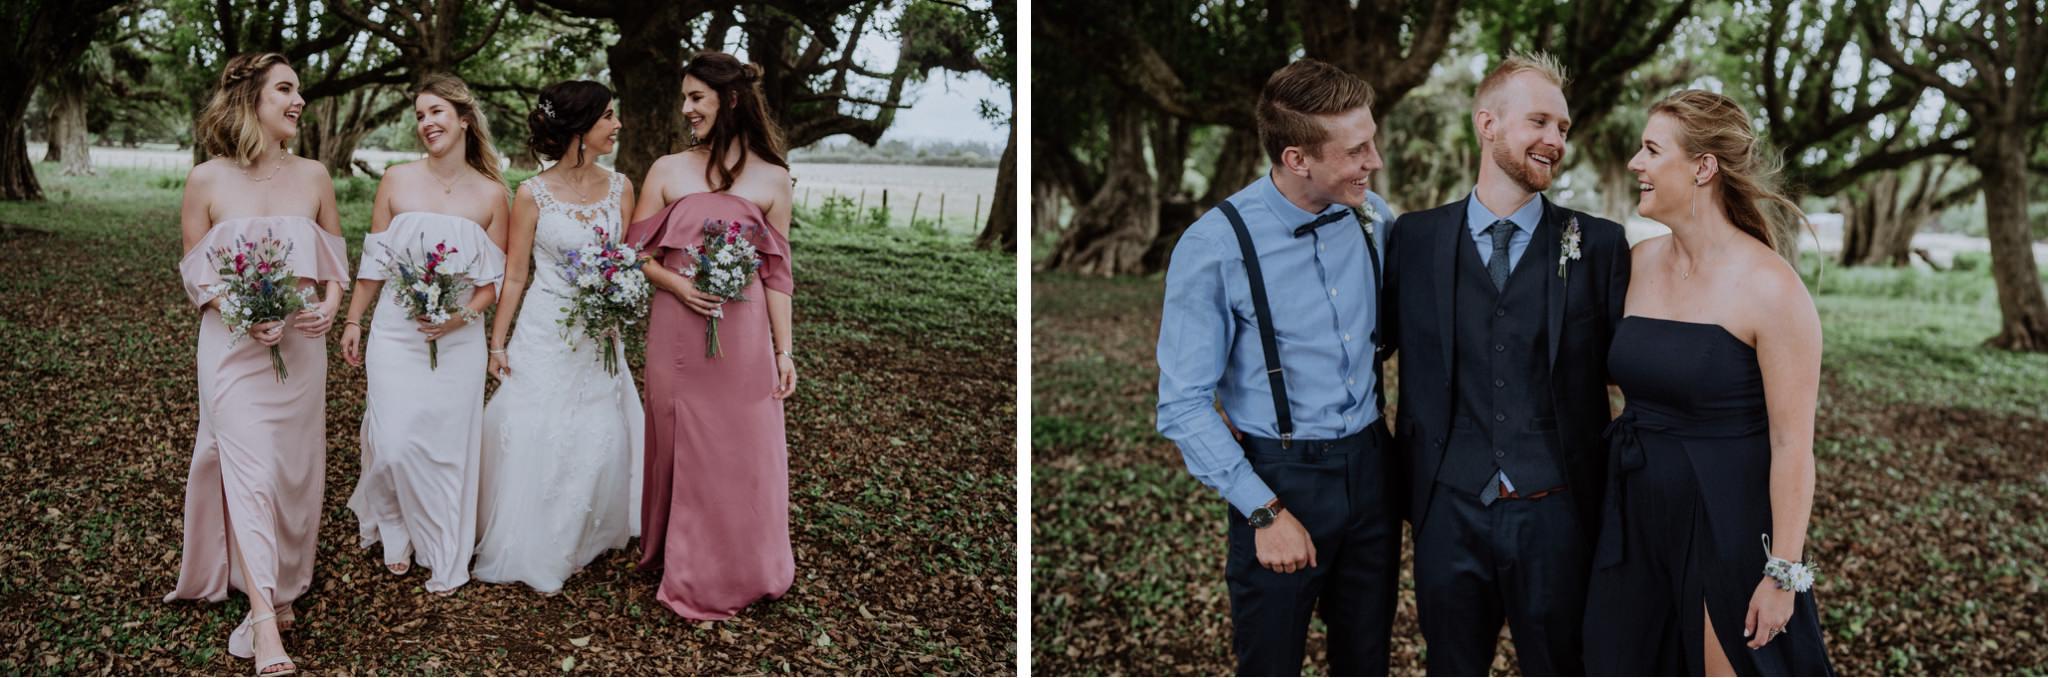 wedding photographer new zealand bay of islands37